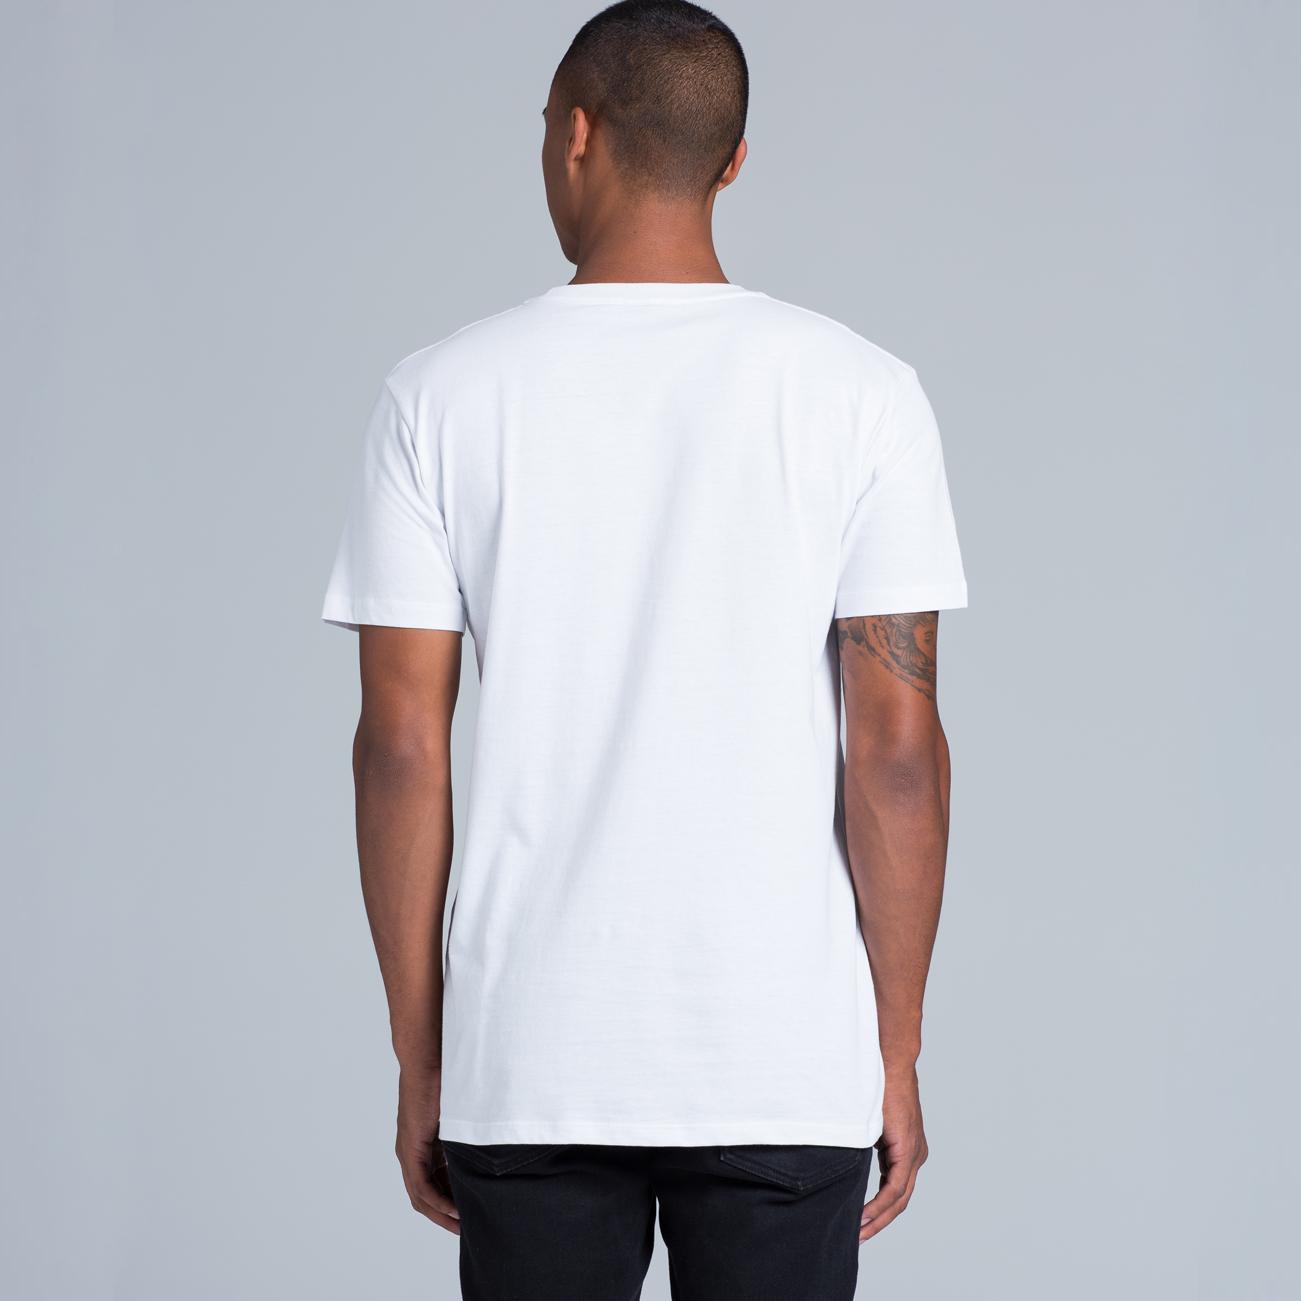 Mens paper t shirt t shirt printing t shirt design for Colour t shirt printing